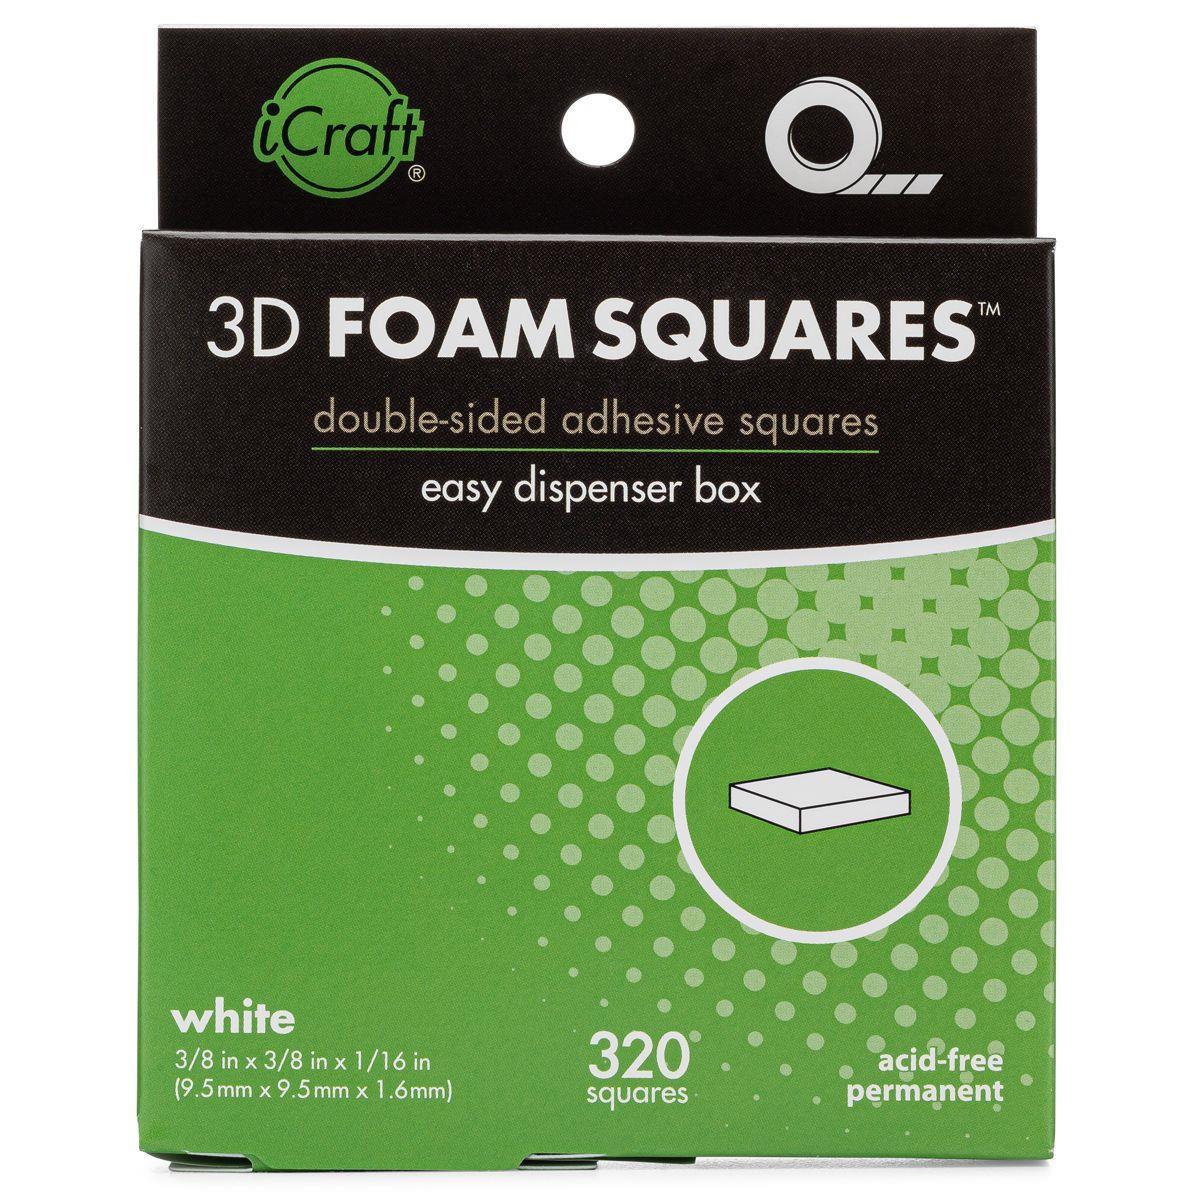 iCraft 3D Foam Squares - White -